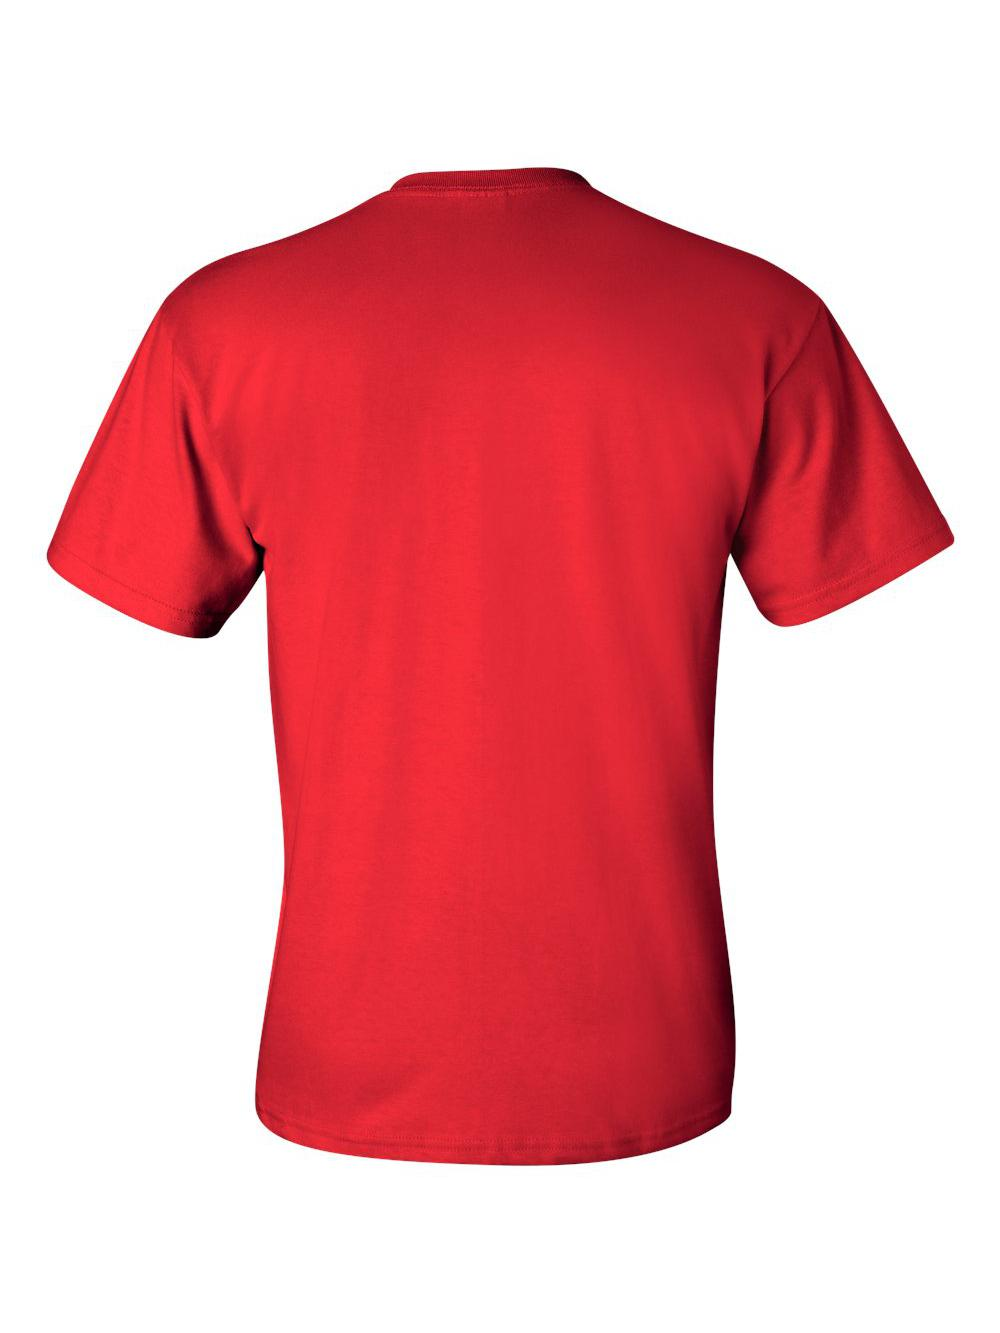 Gildan-Ultra-Cotton-T-Shirt-with-a-Pocket-2300 thumbnail 28